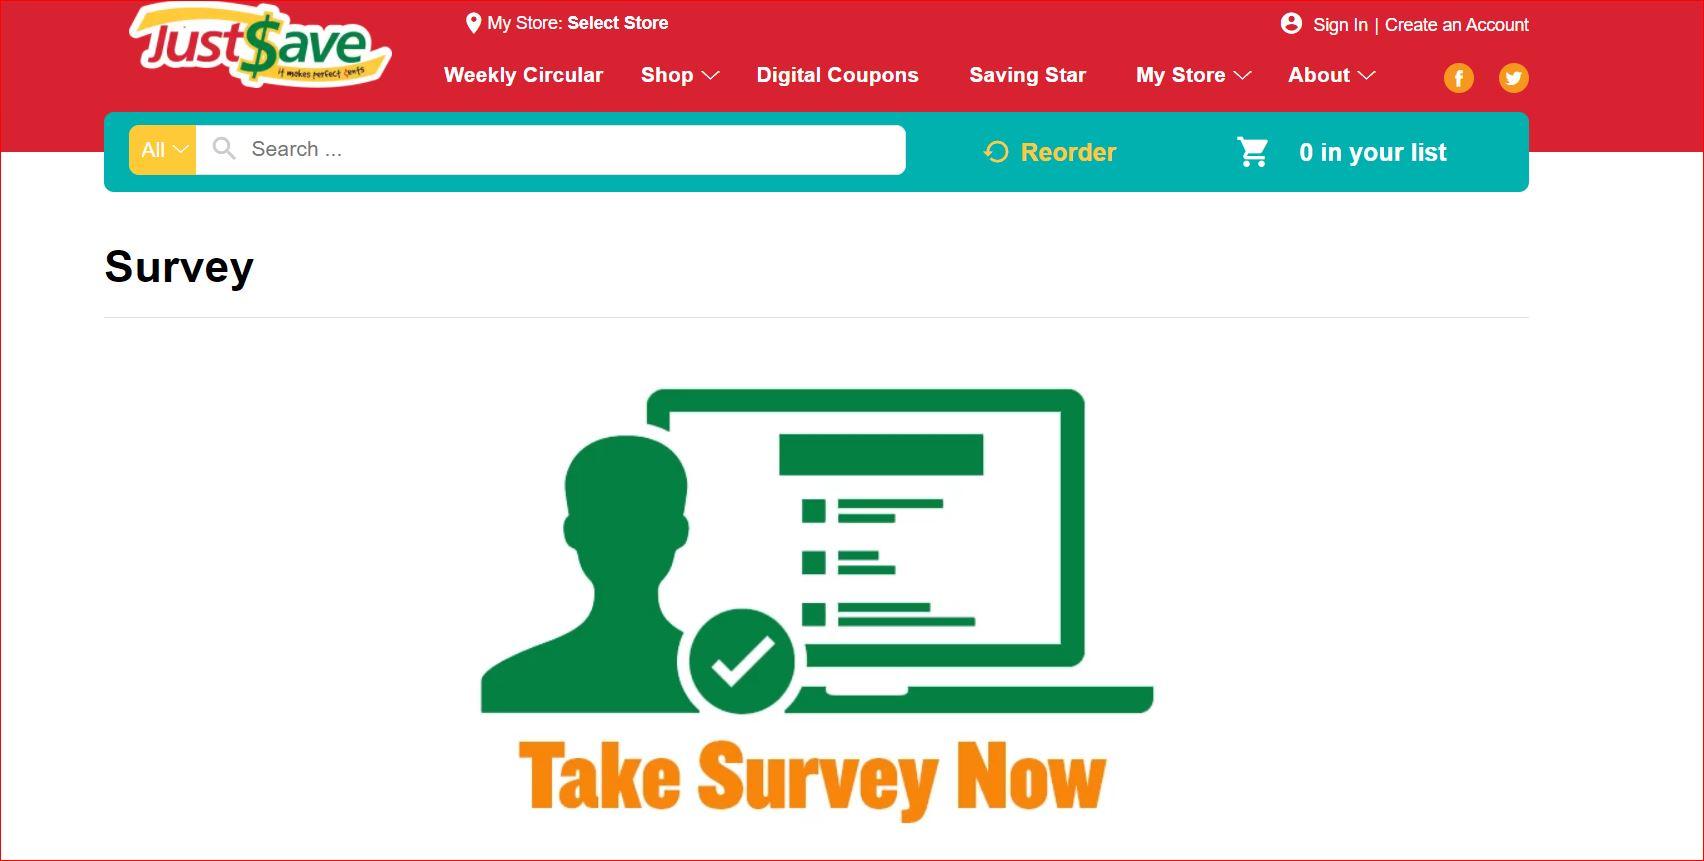 www.justsavefoods.com/survey